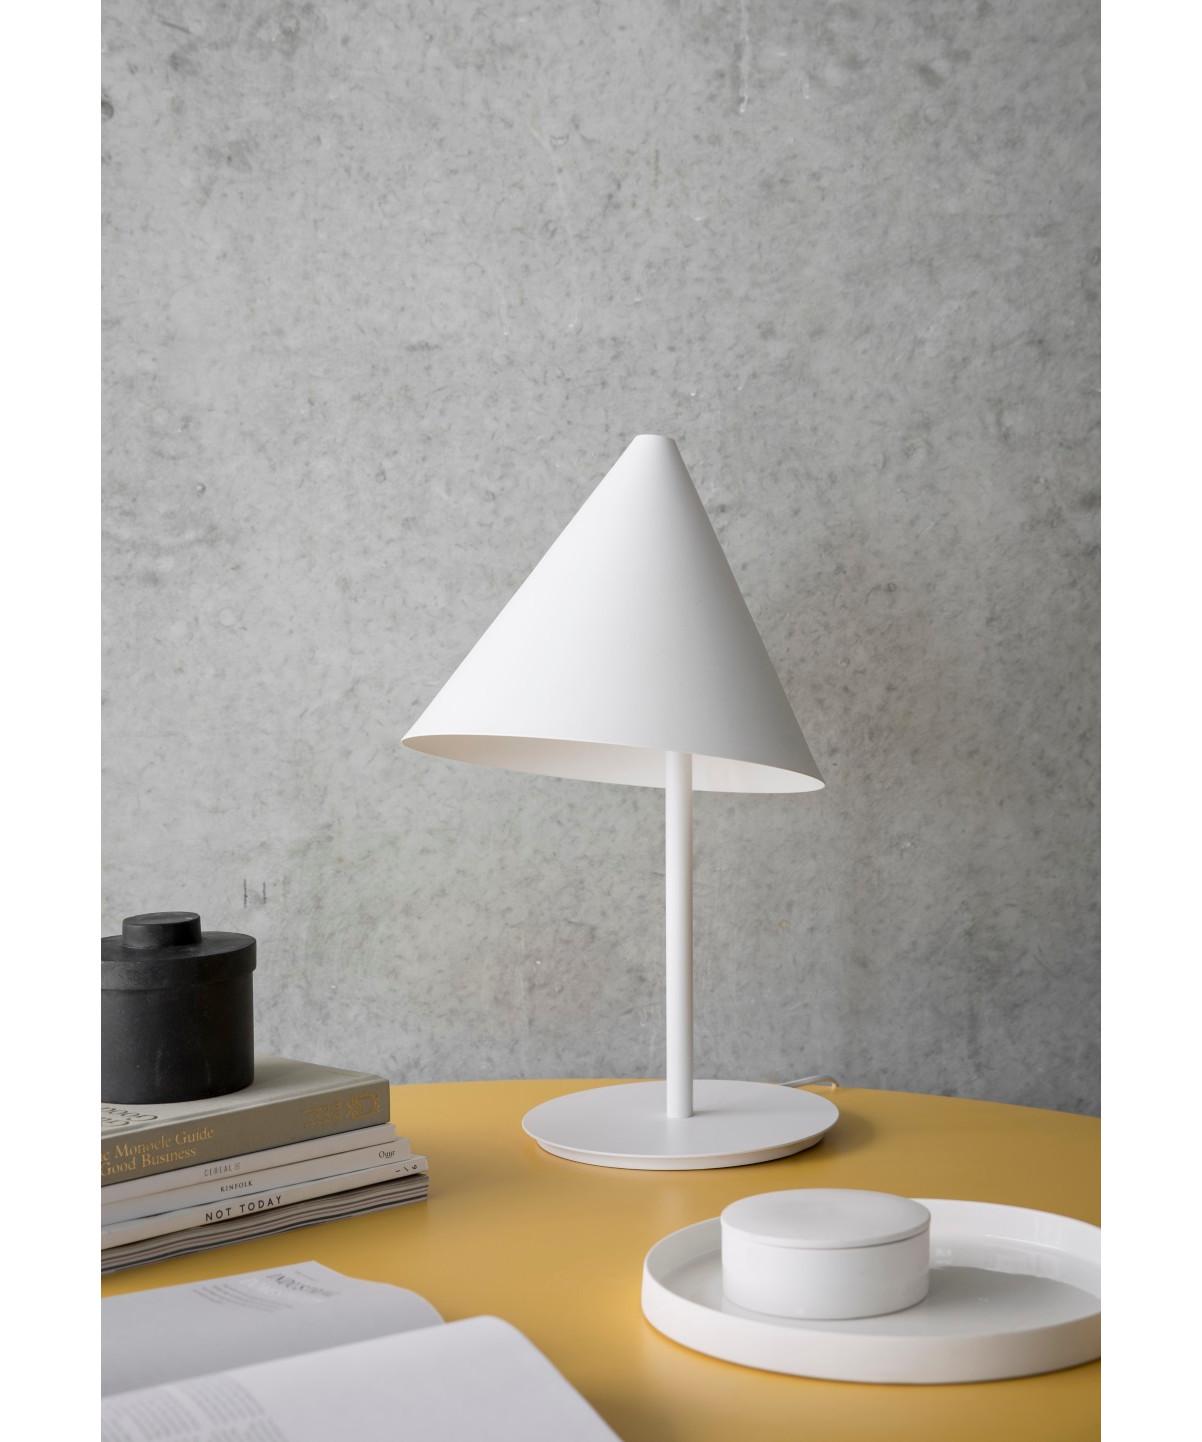 conic tischleuchte wei menu. Black Bedroom Furniture Sets. Home Design Ideas